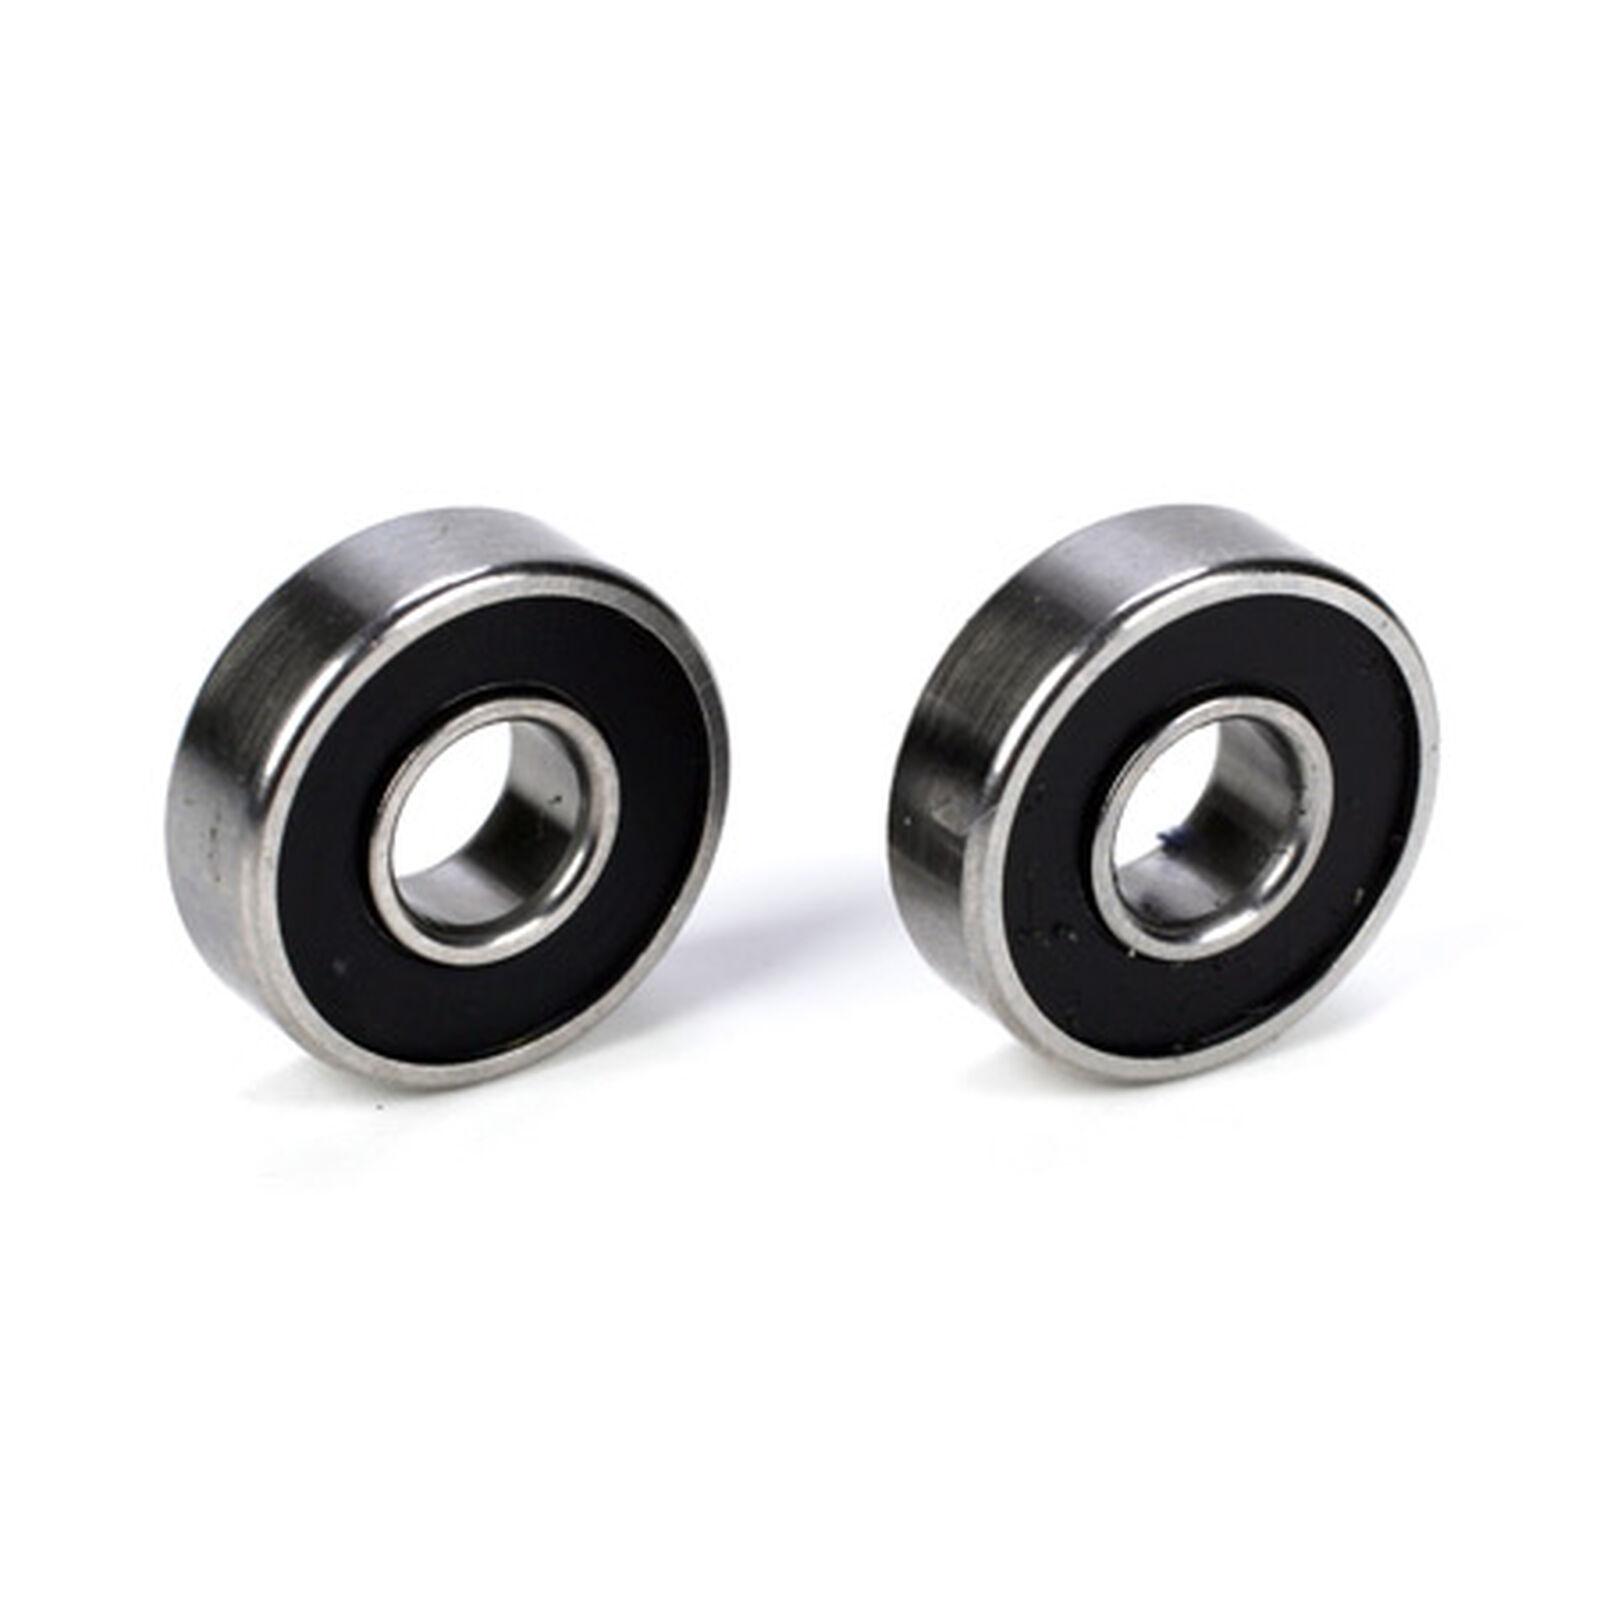 5 x 13mm HD Clutch Bearings (2):8B, 8T, 22, 22T, 22SCT, 22-4, 8X, 8XE